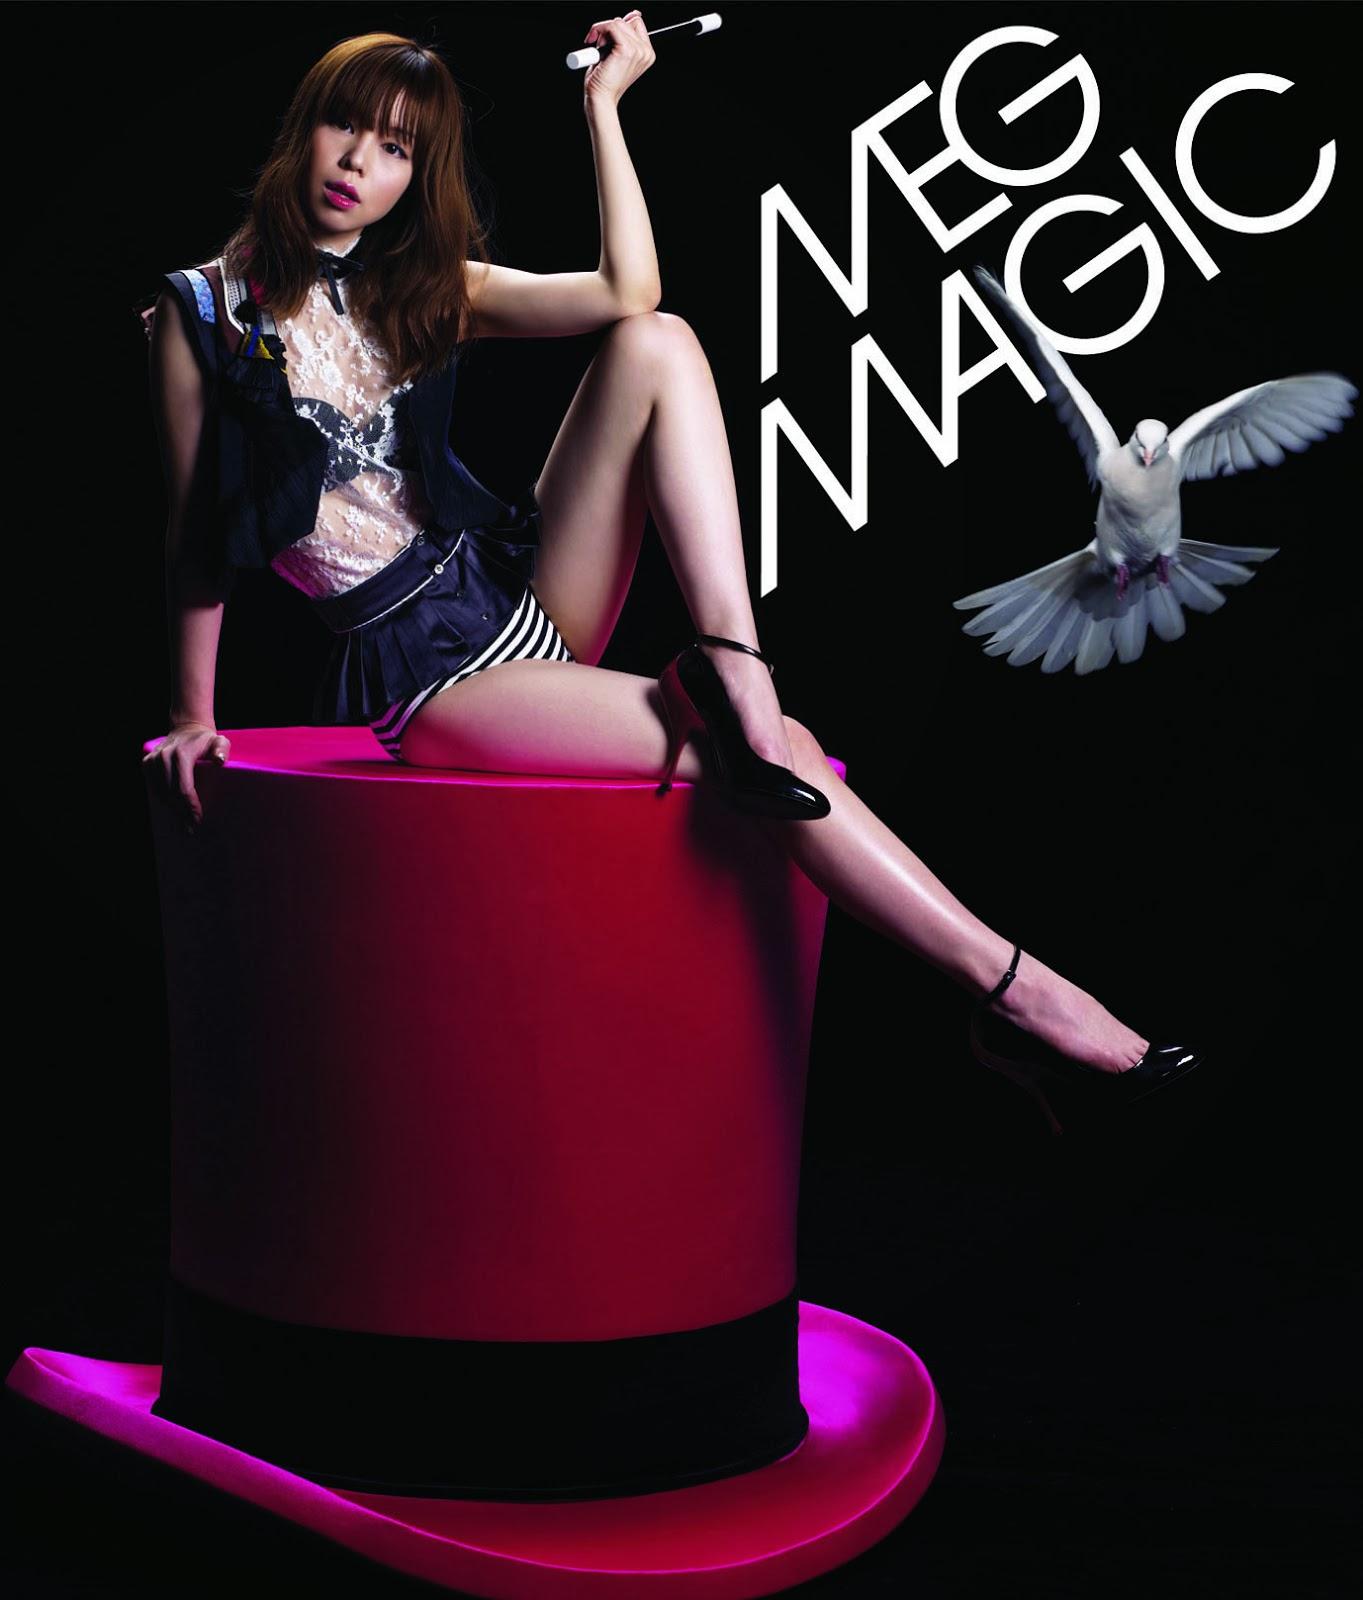 Meg Magic Nude Photos 8